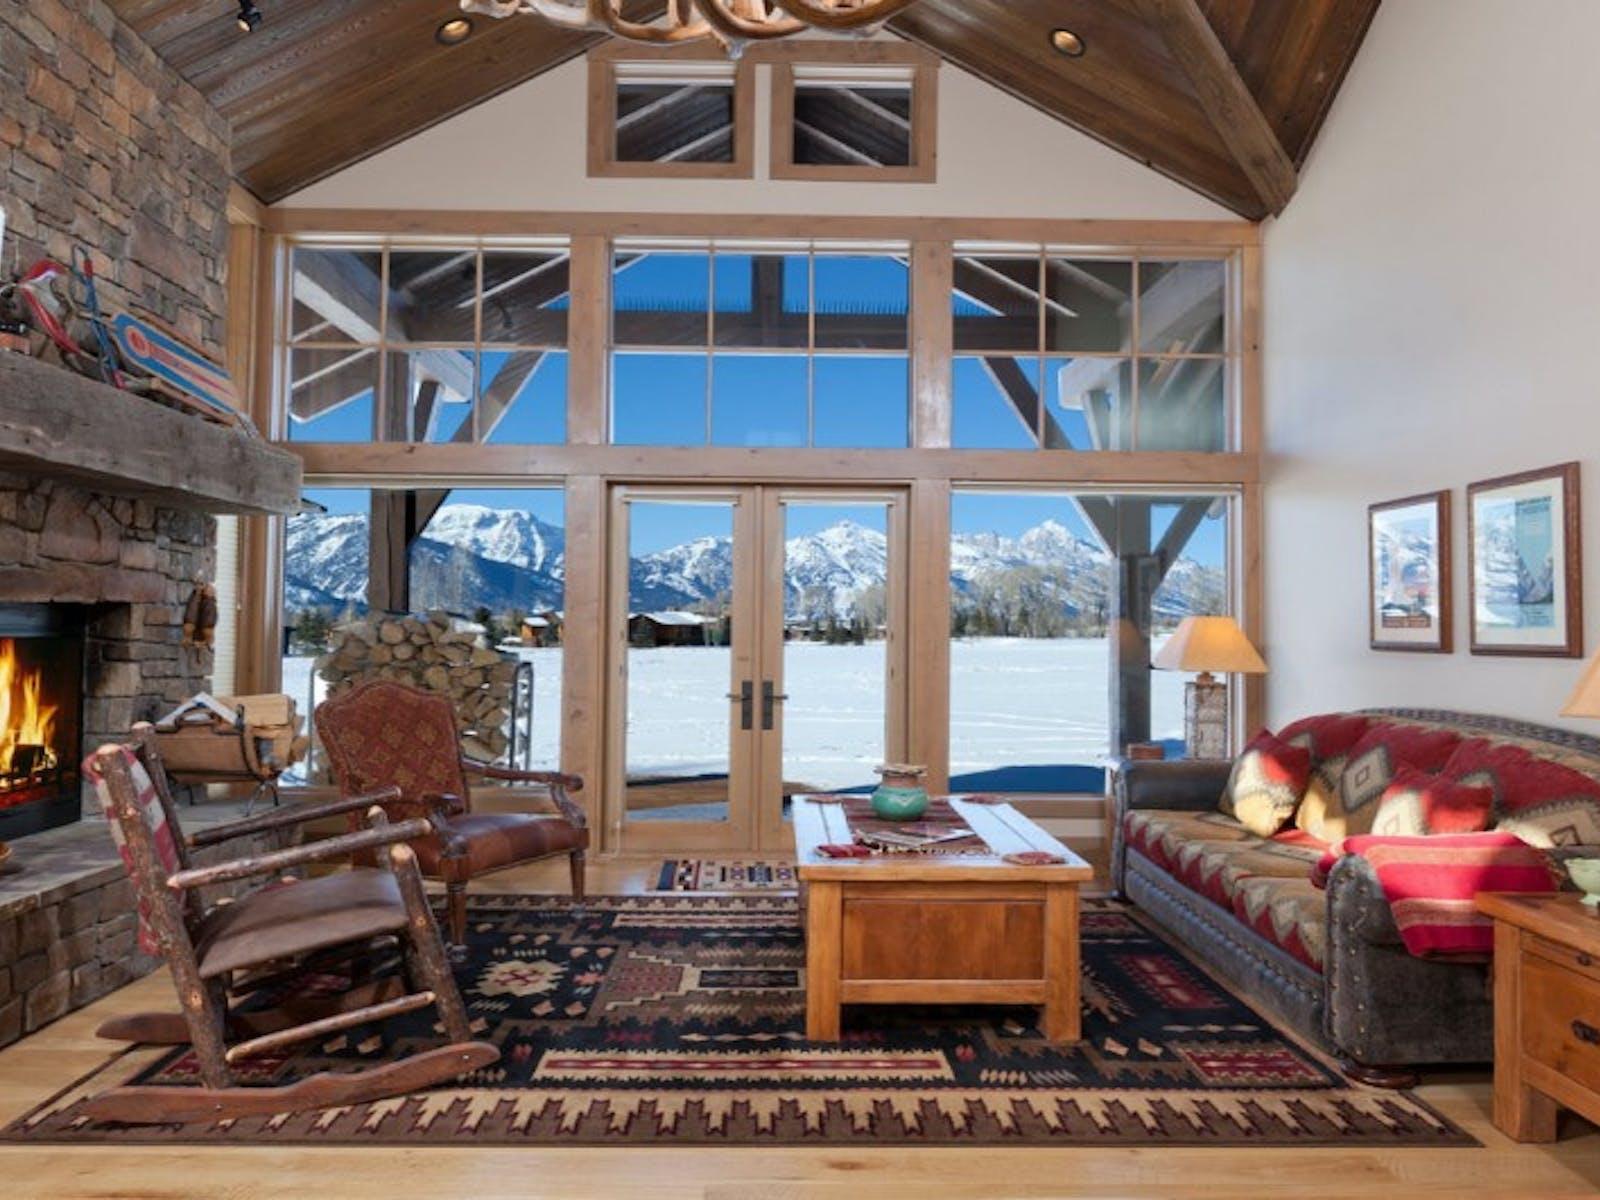 stone fireplace and cozy decor inside jackson hole, wy cabin